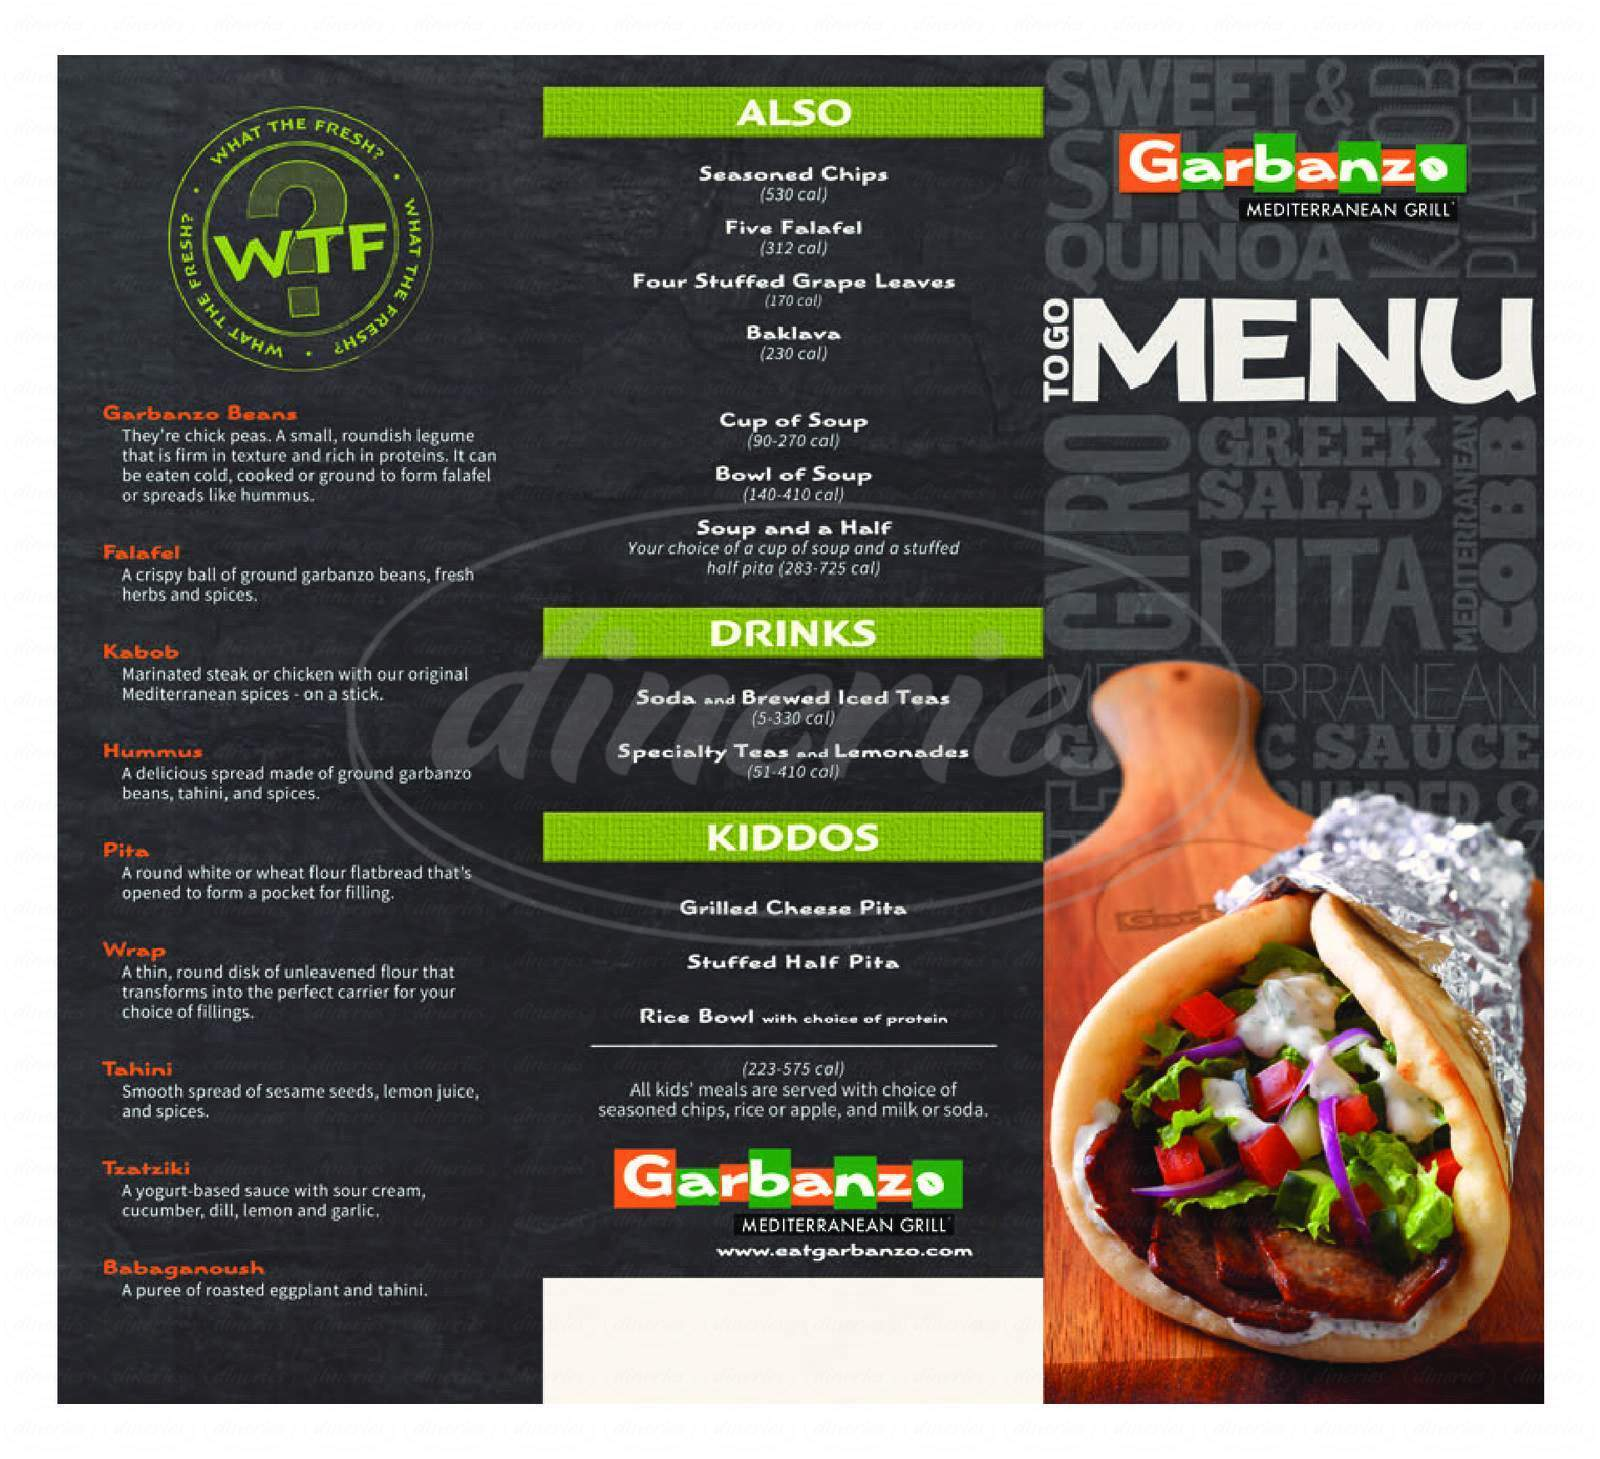 menu for Garbanzo Mediterranean Food